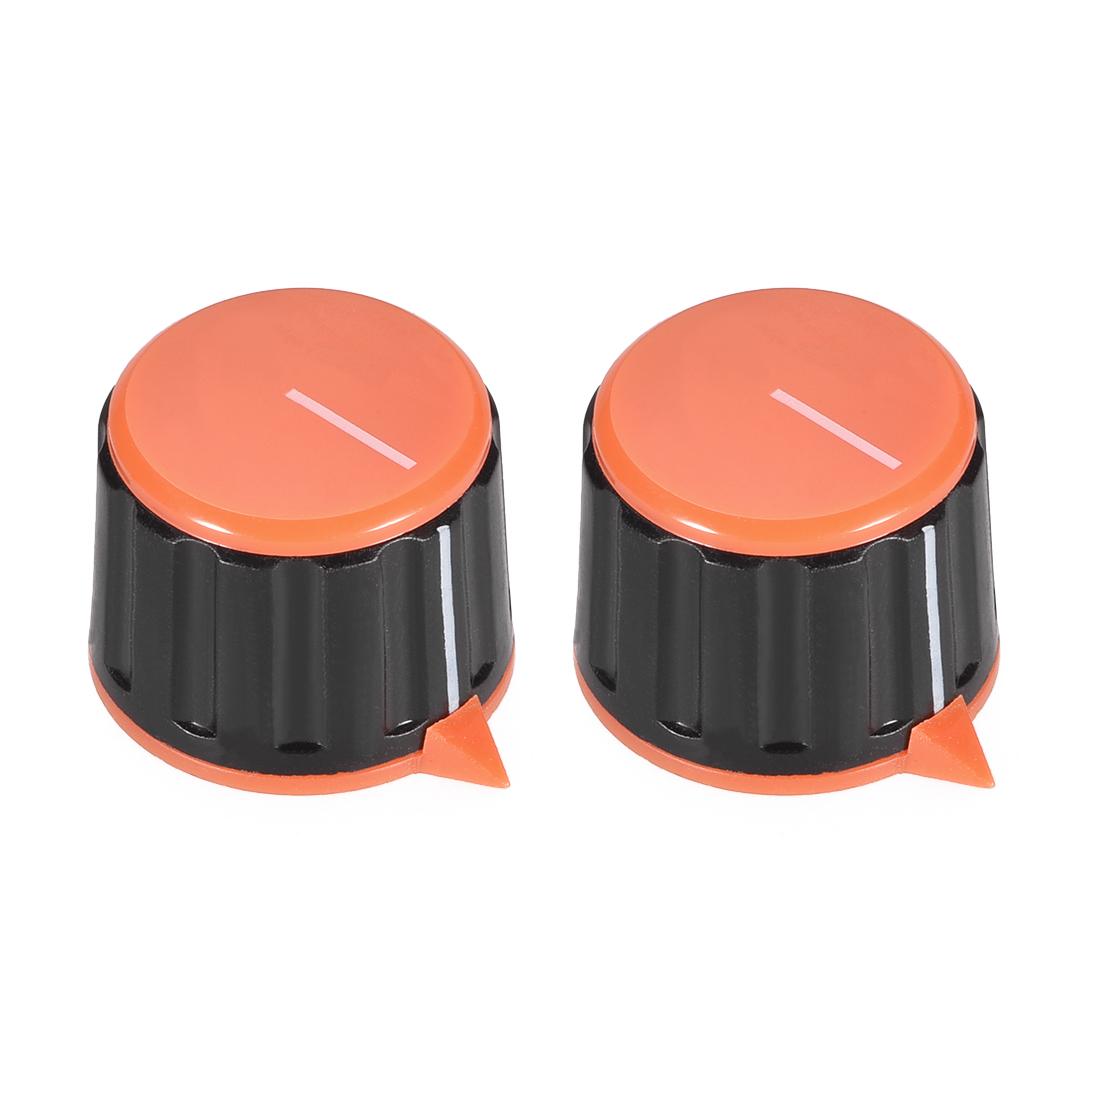 2pcs 6mm Potentiometer Control Knobs For Guitar Acrylic Volume Tone Knobs Orange